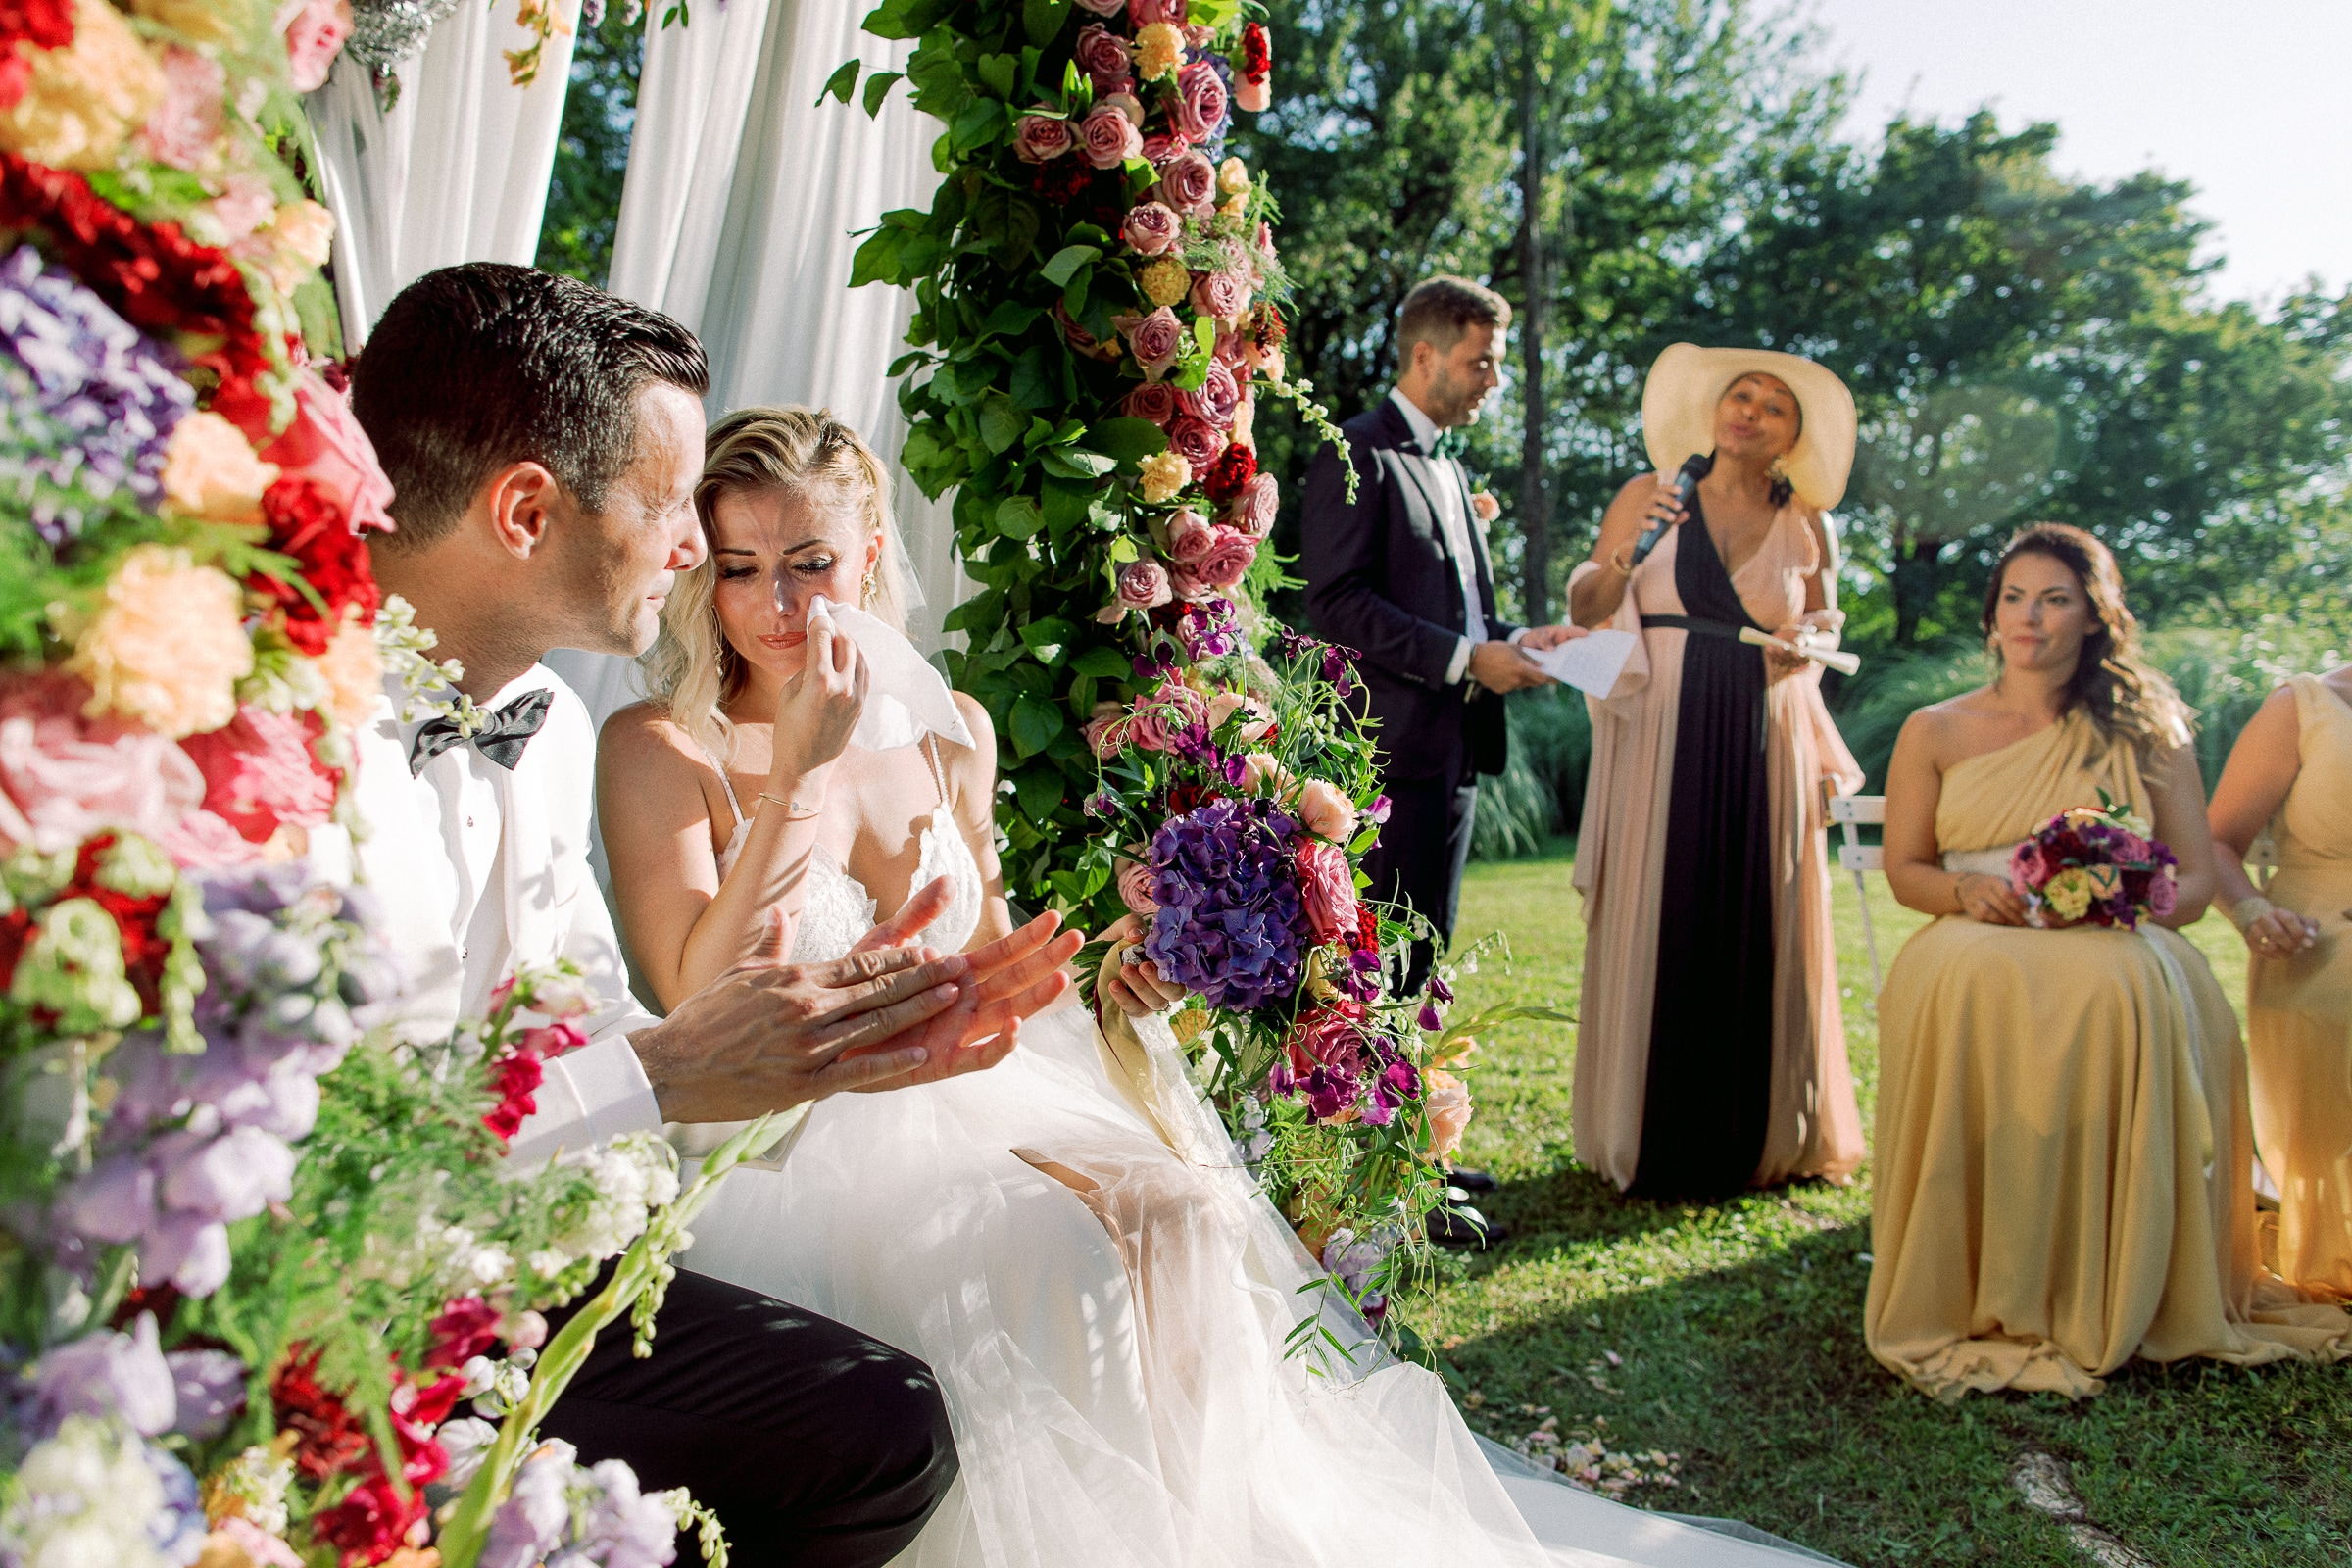 - photo by Sylvain Bouzat Wedding Photographer